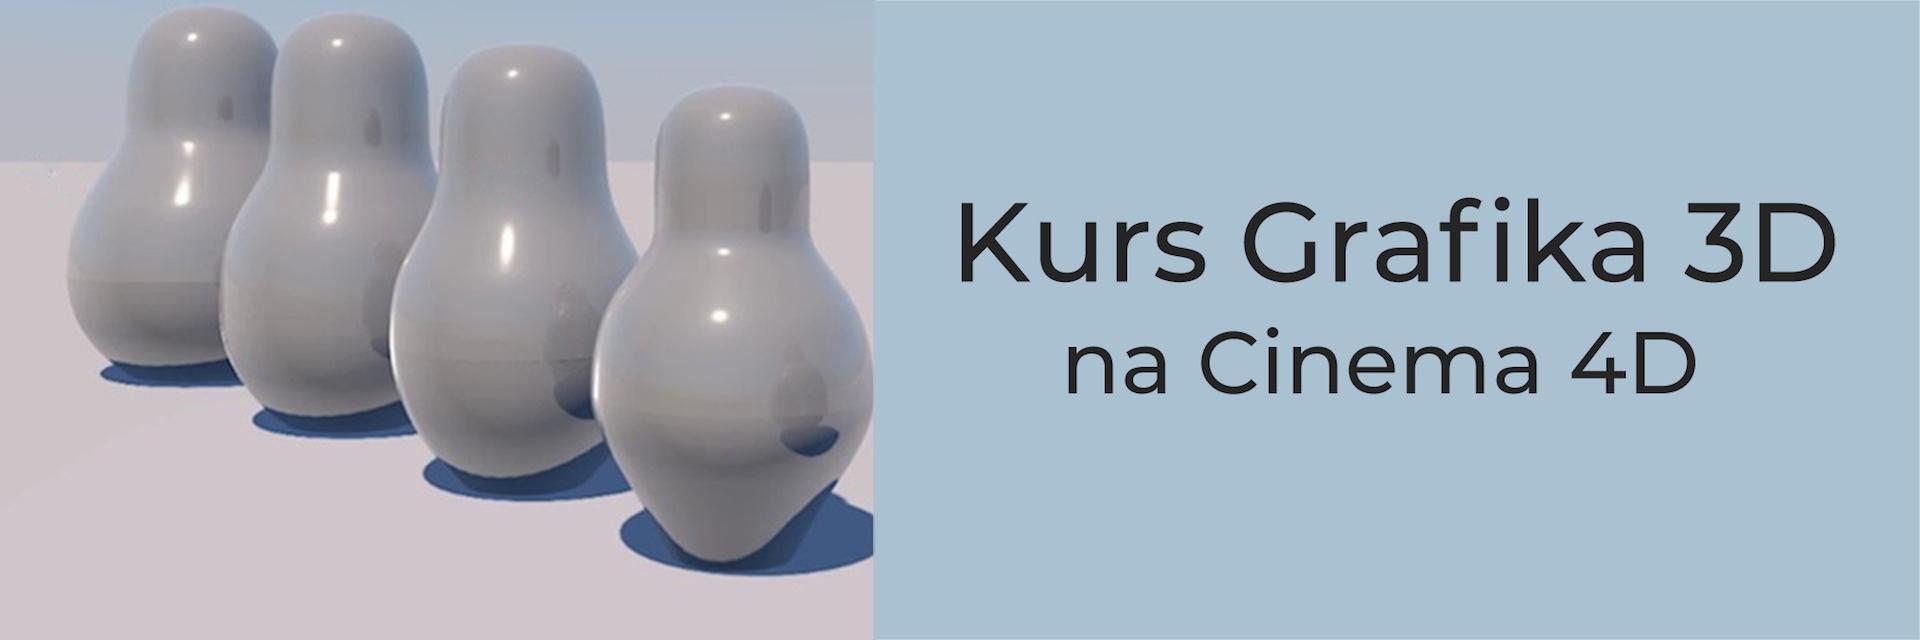 Kurs Cinema 4D